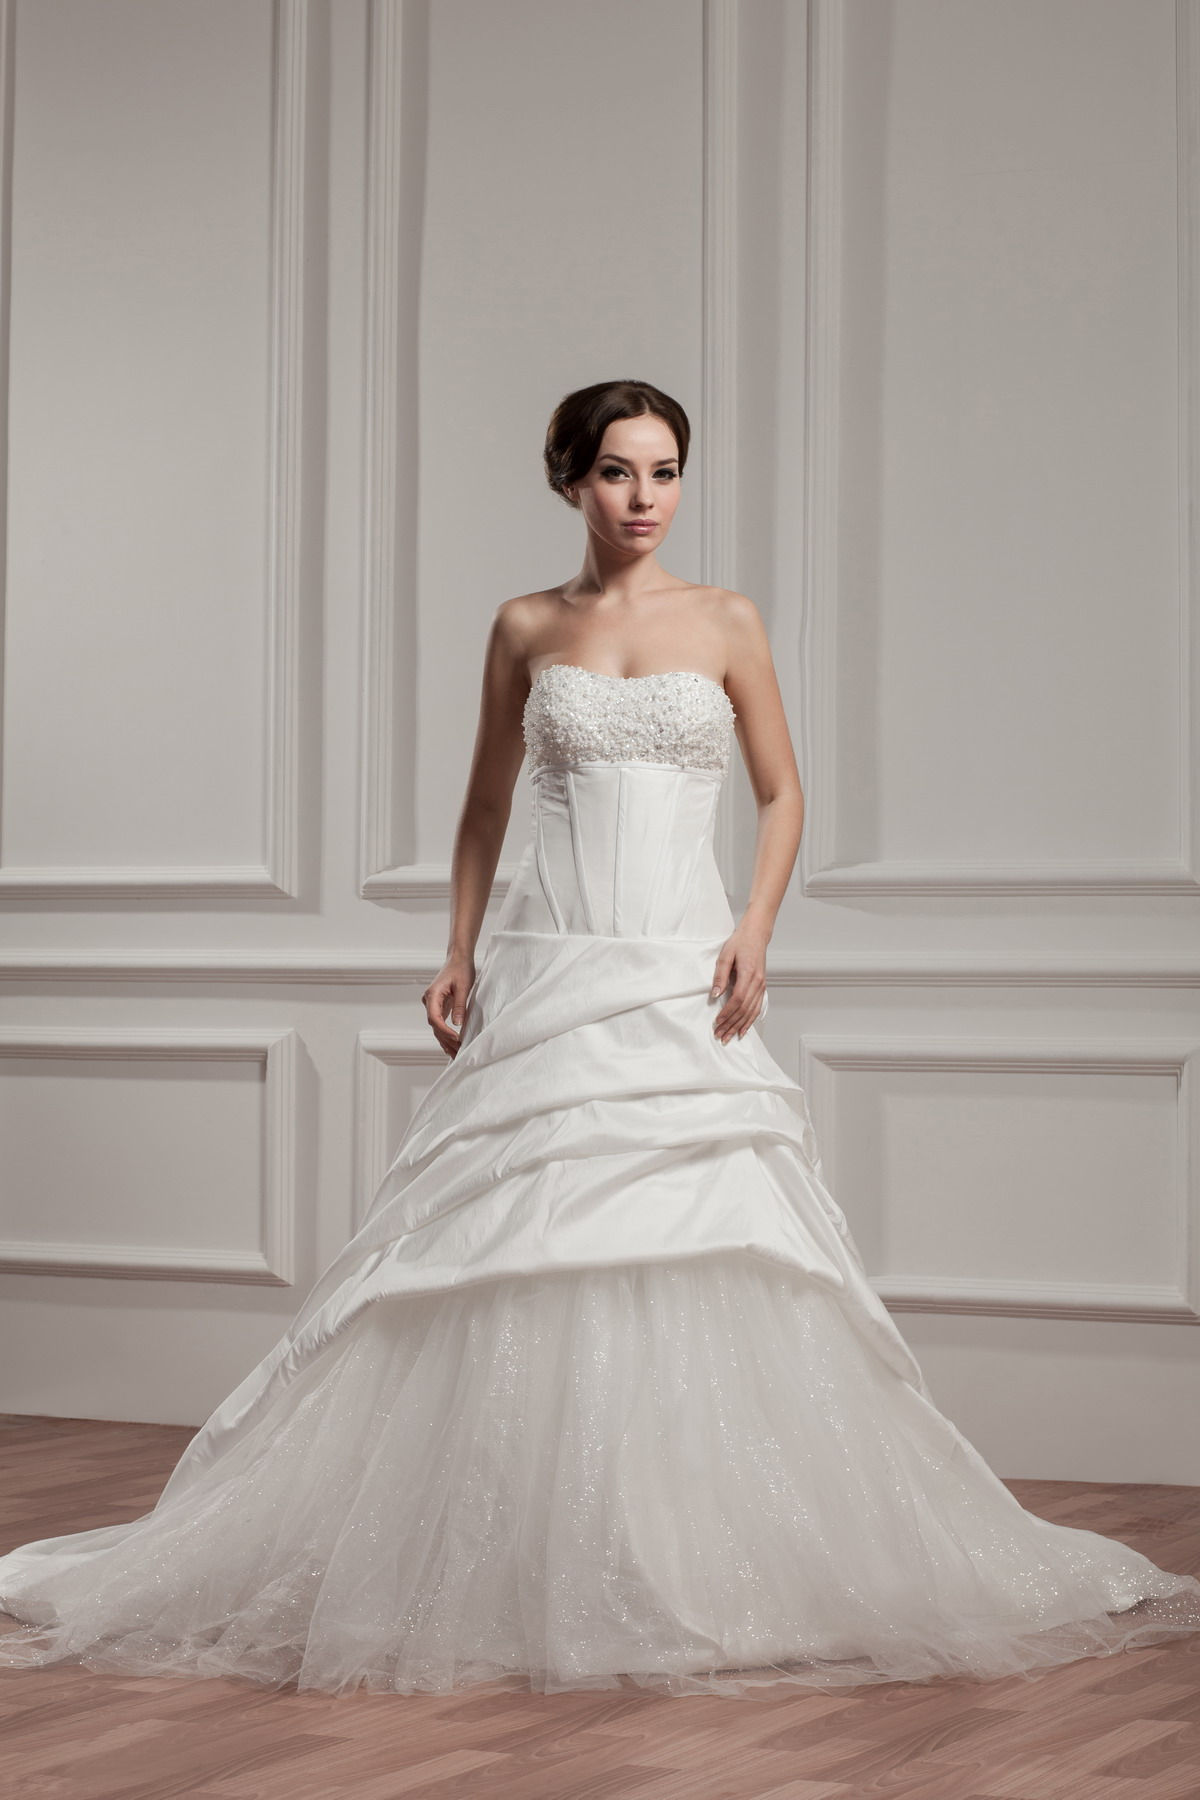 Wedding Gowns On Sale: Gypsy Wedding Dress With Floor Length Court Train